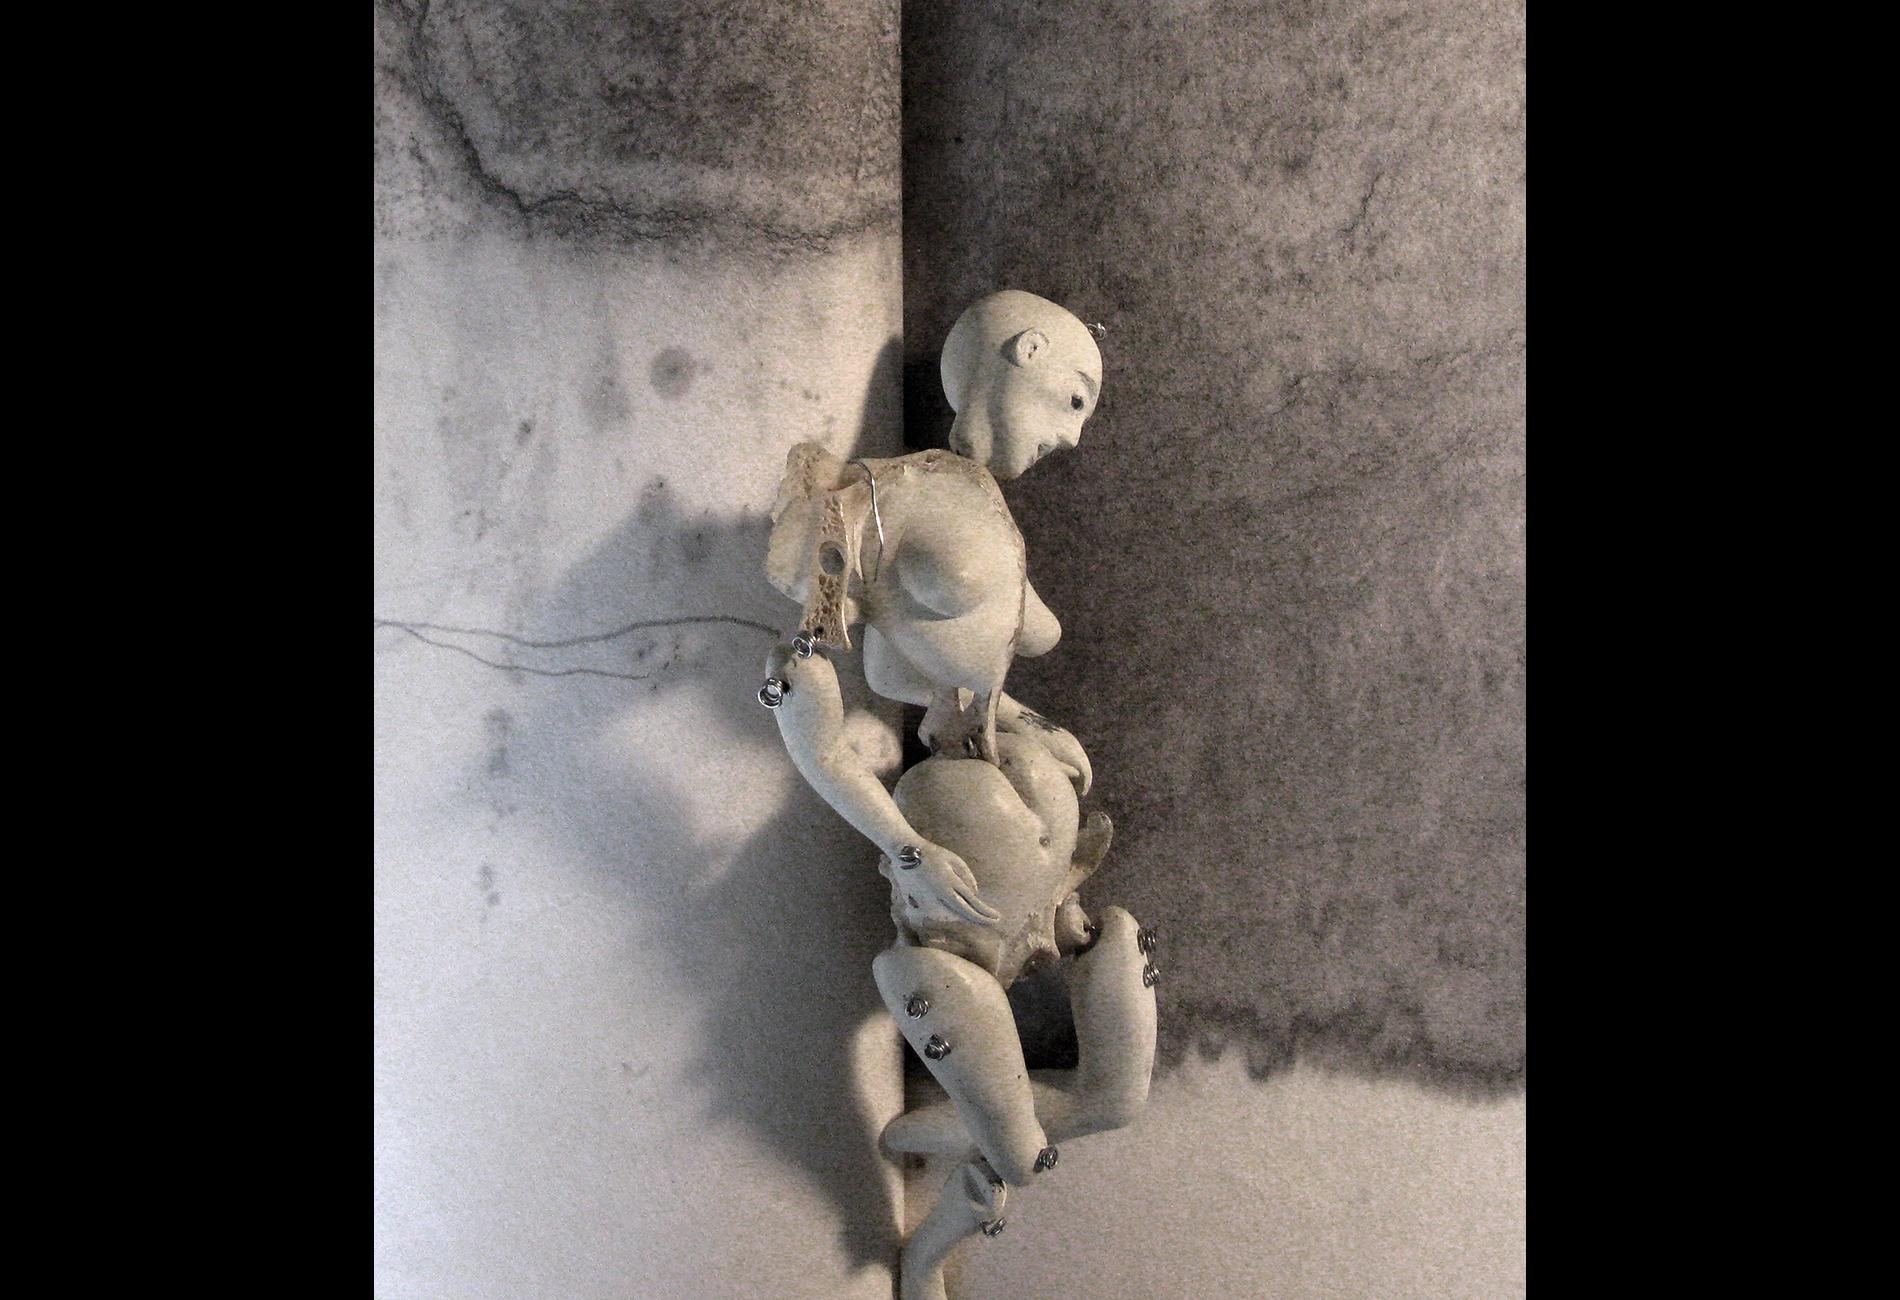 FIRMAMENT, bone doll detail